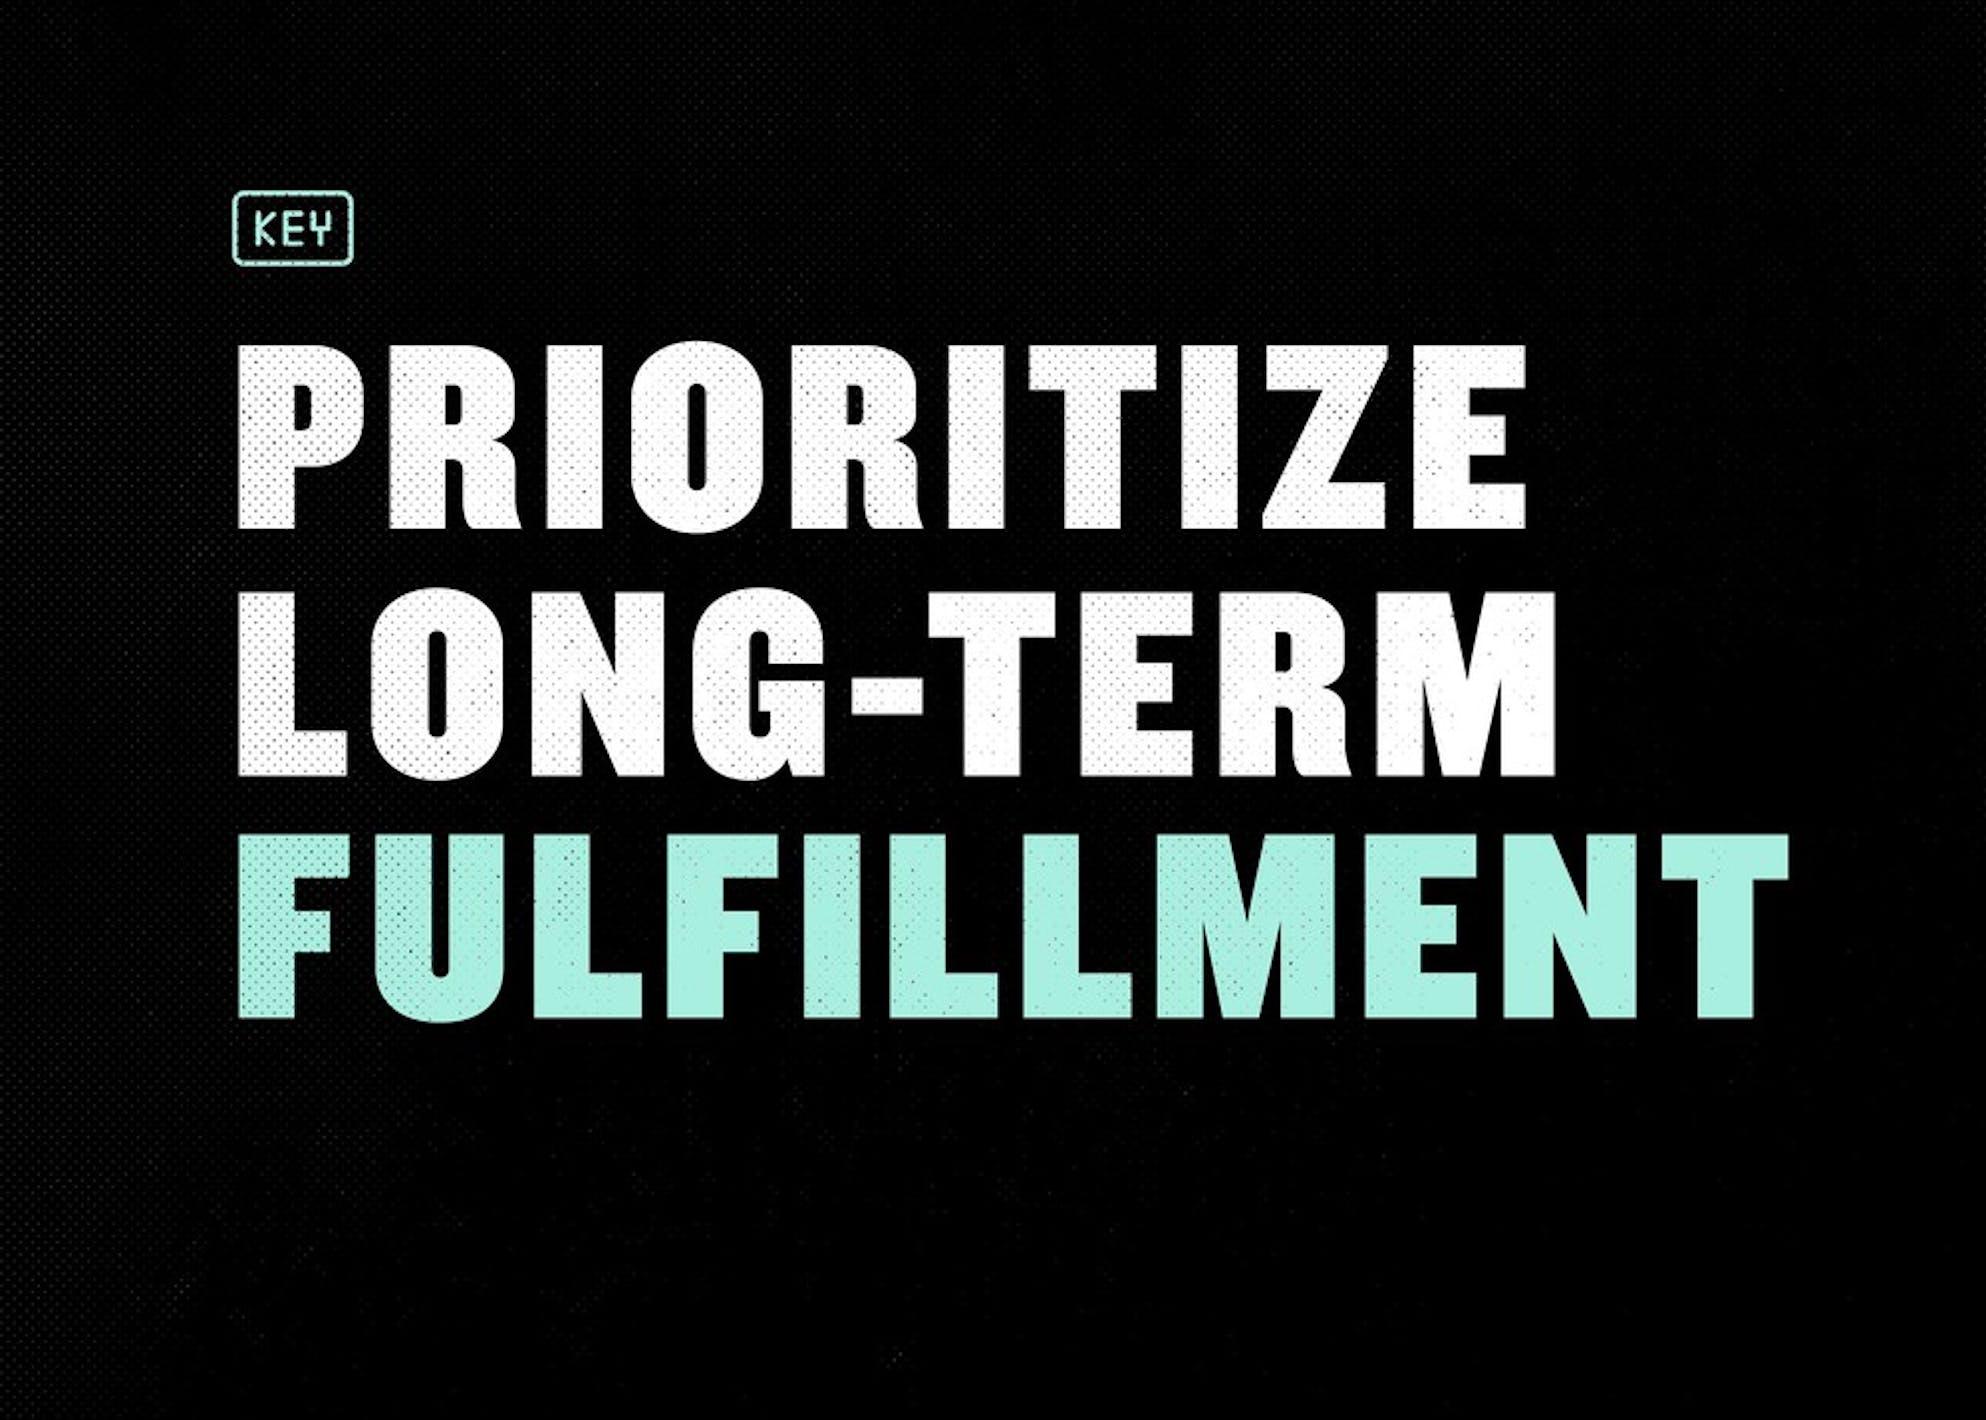 Long-term fulfillment is a key benefit of smart goal setting